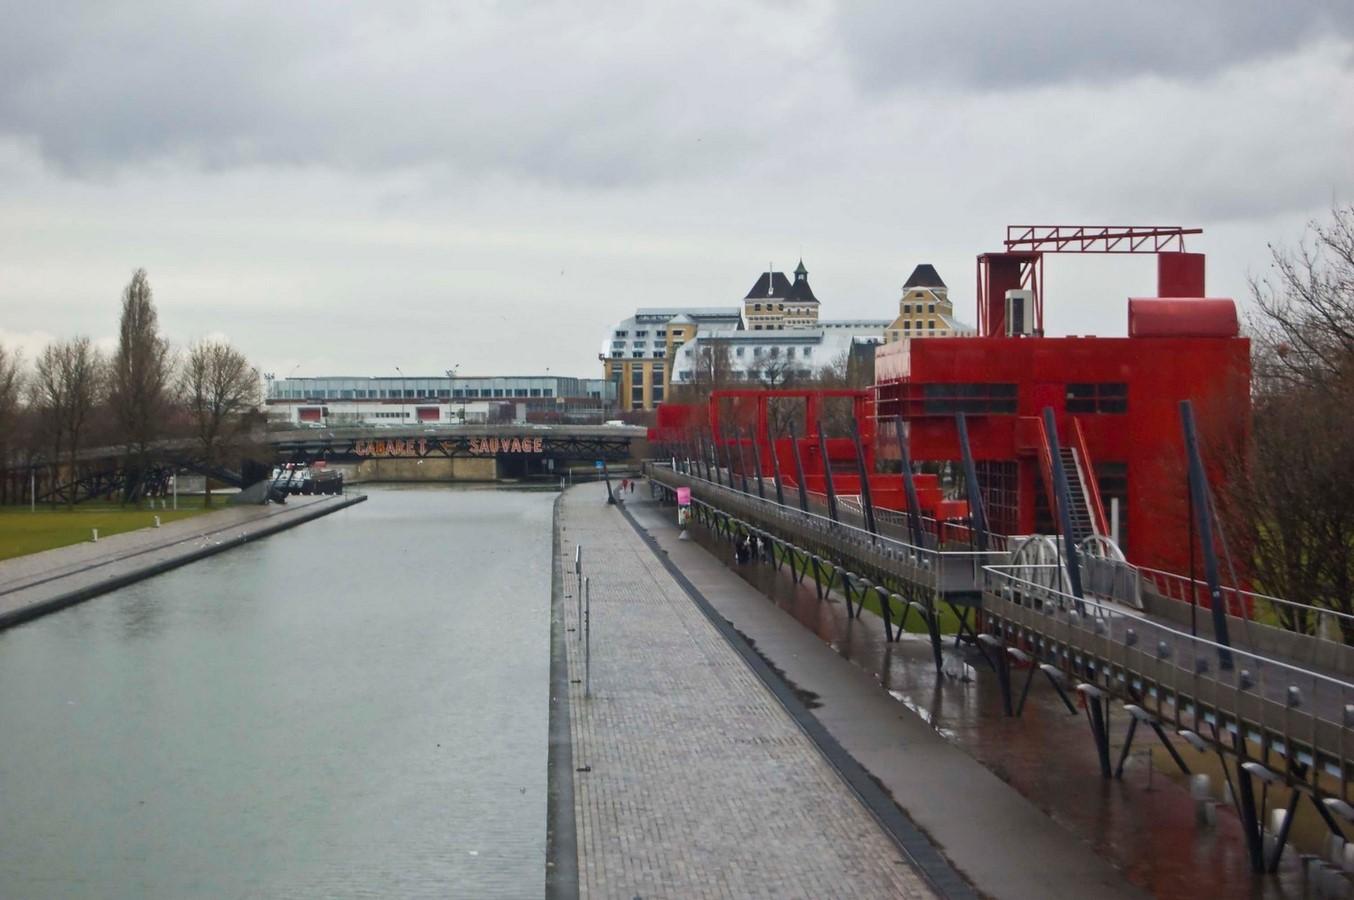 Parc de La Villette, Paris, France | Bernard Tschumi - Sheet1